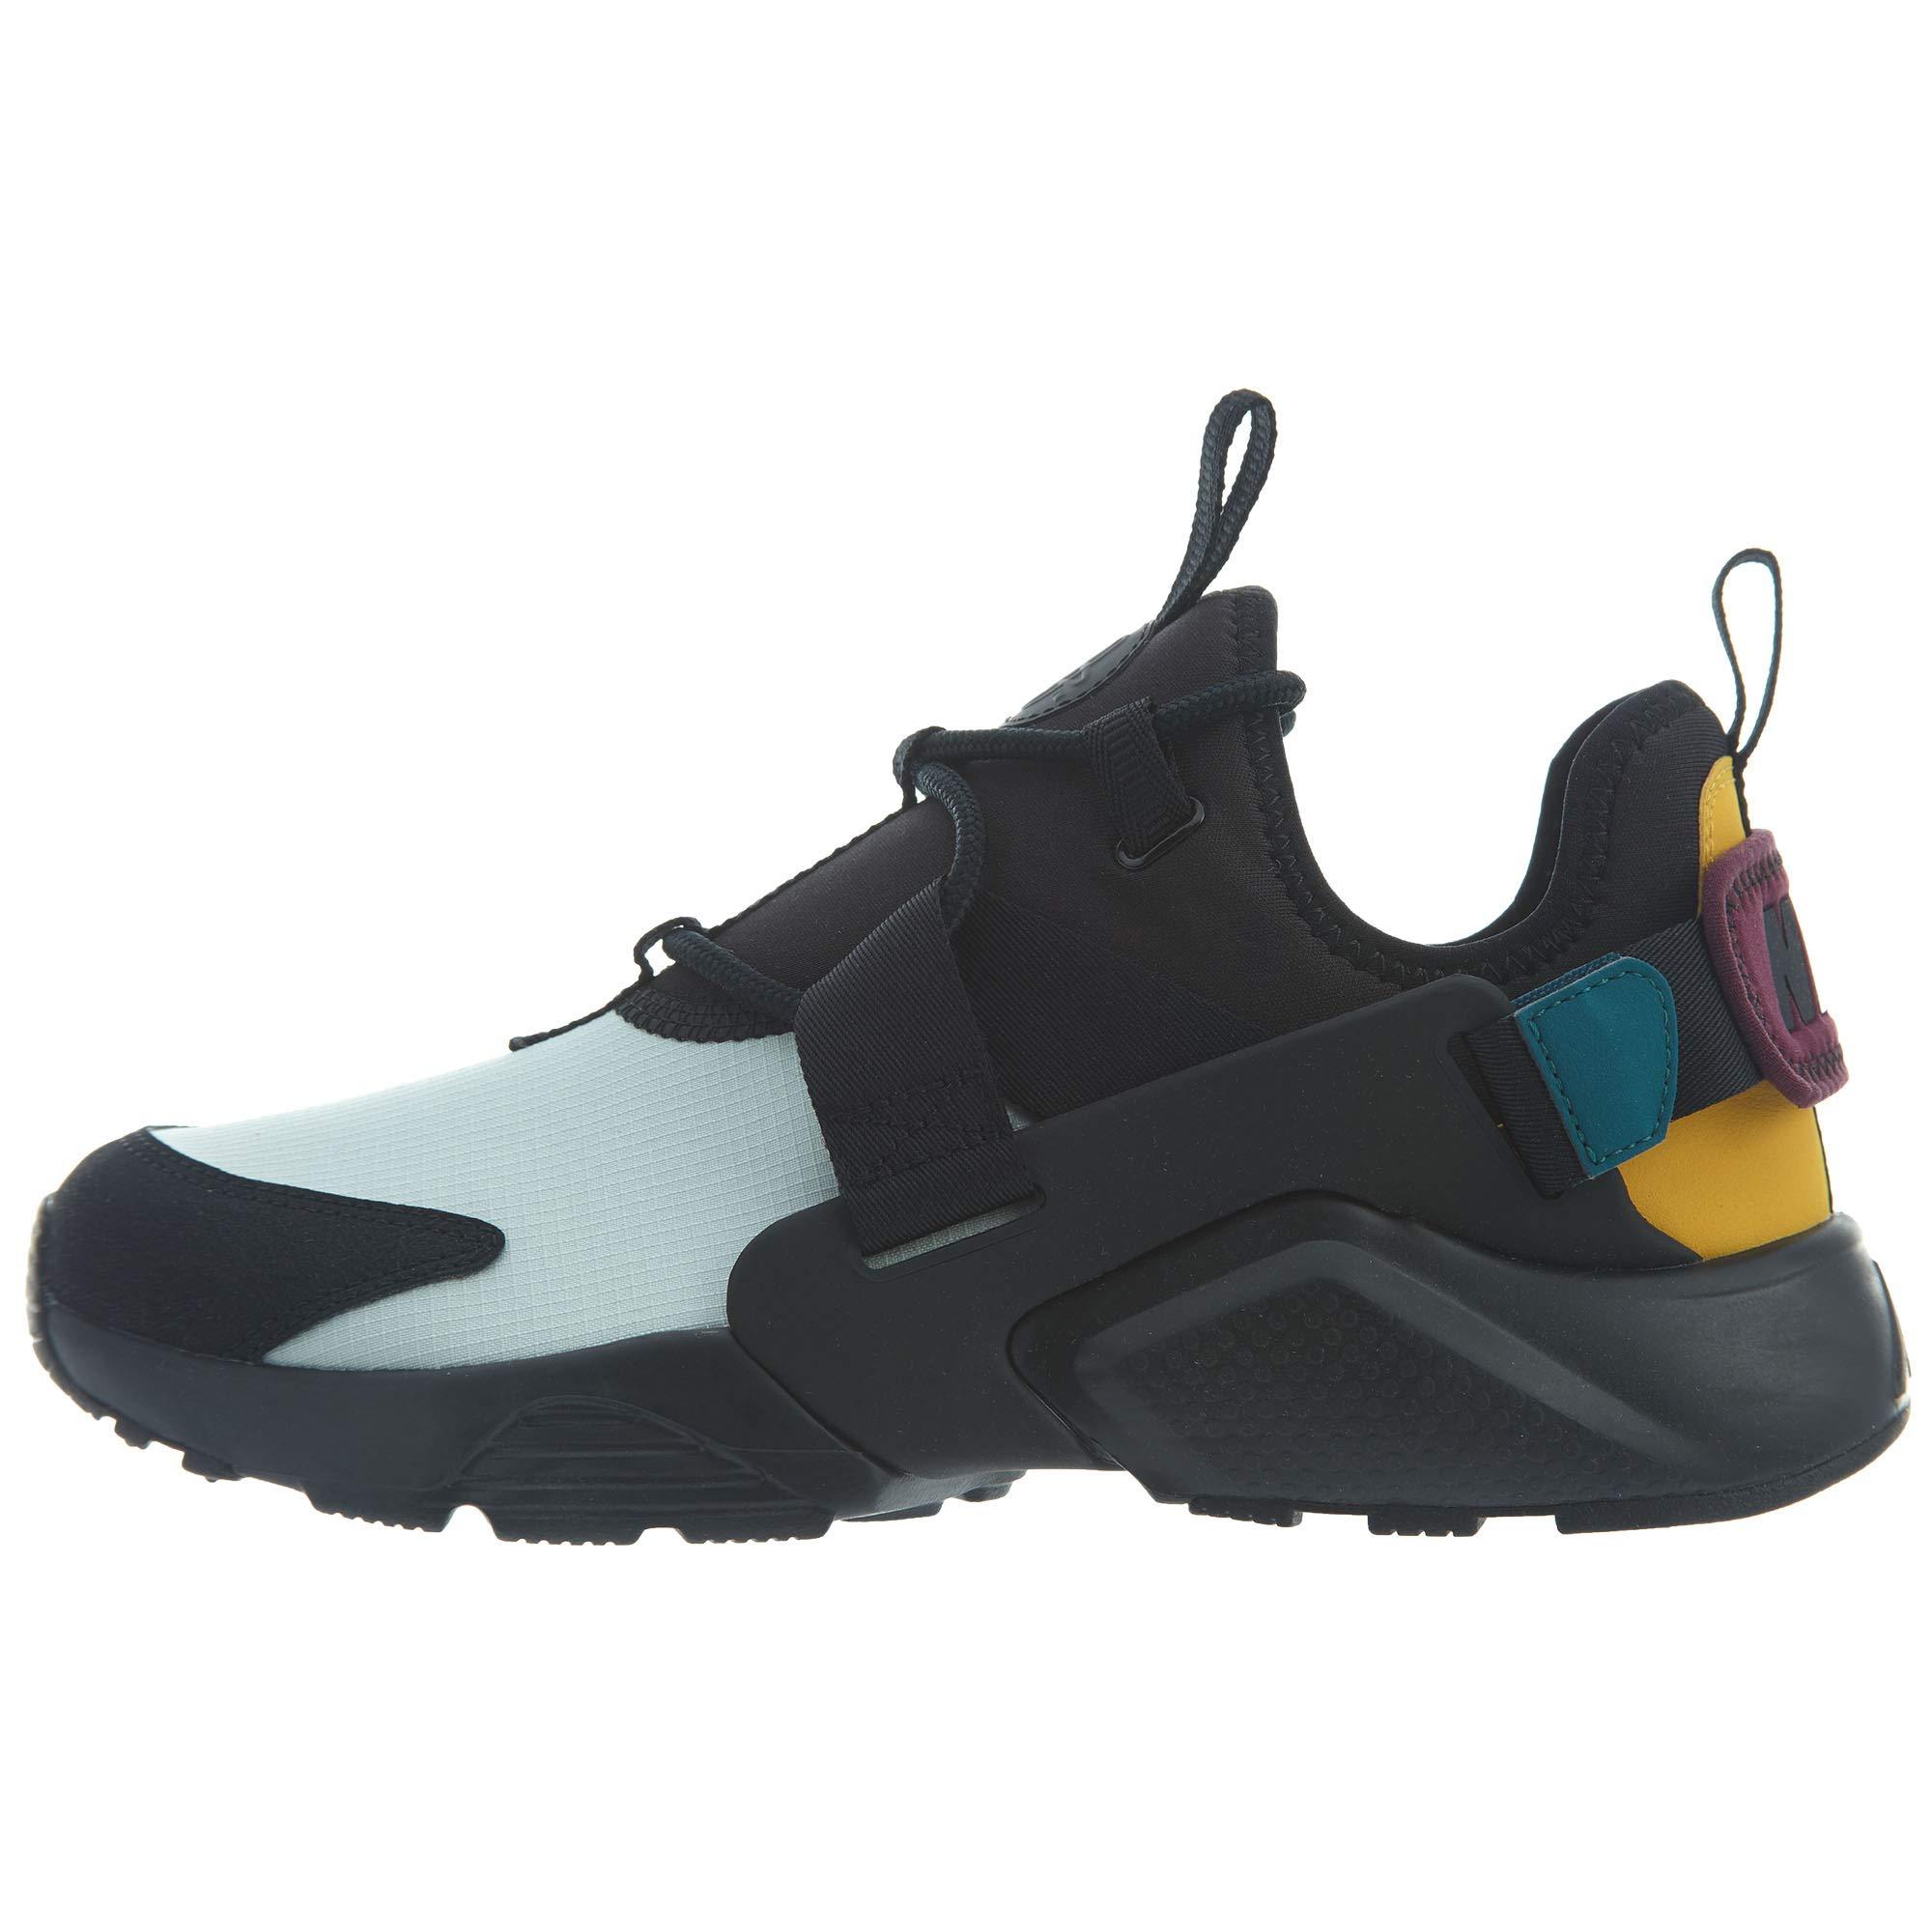 b28477eb7bad1 Galleon - Nike W Air Huarache City Low Womens Ah6804-011 Size 7